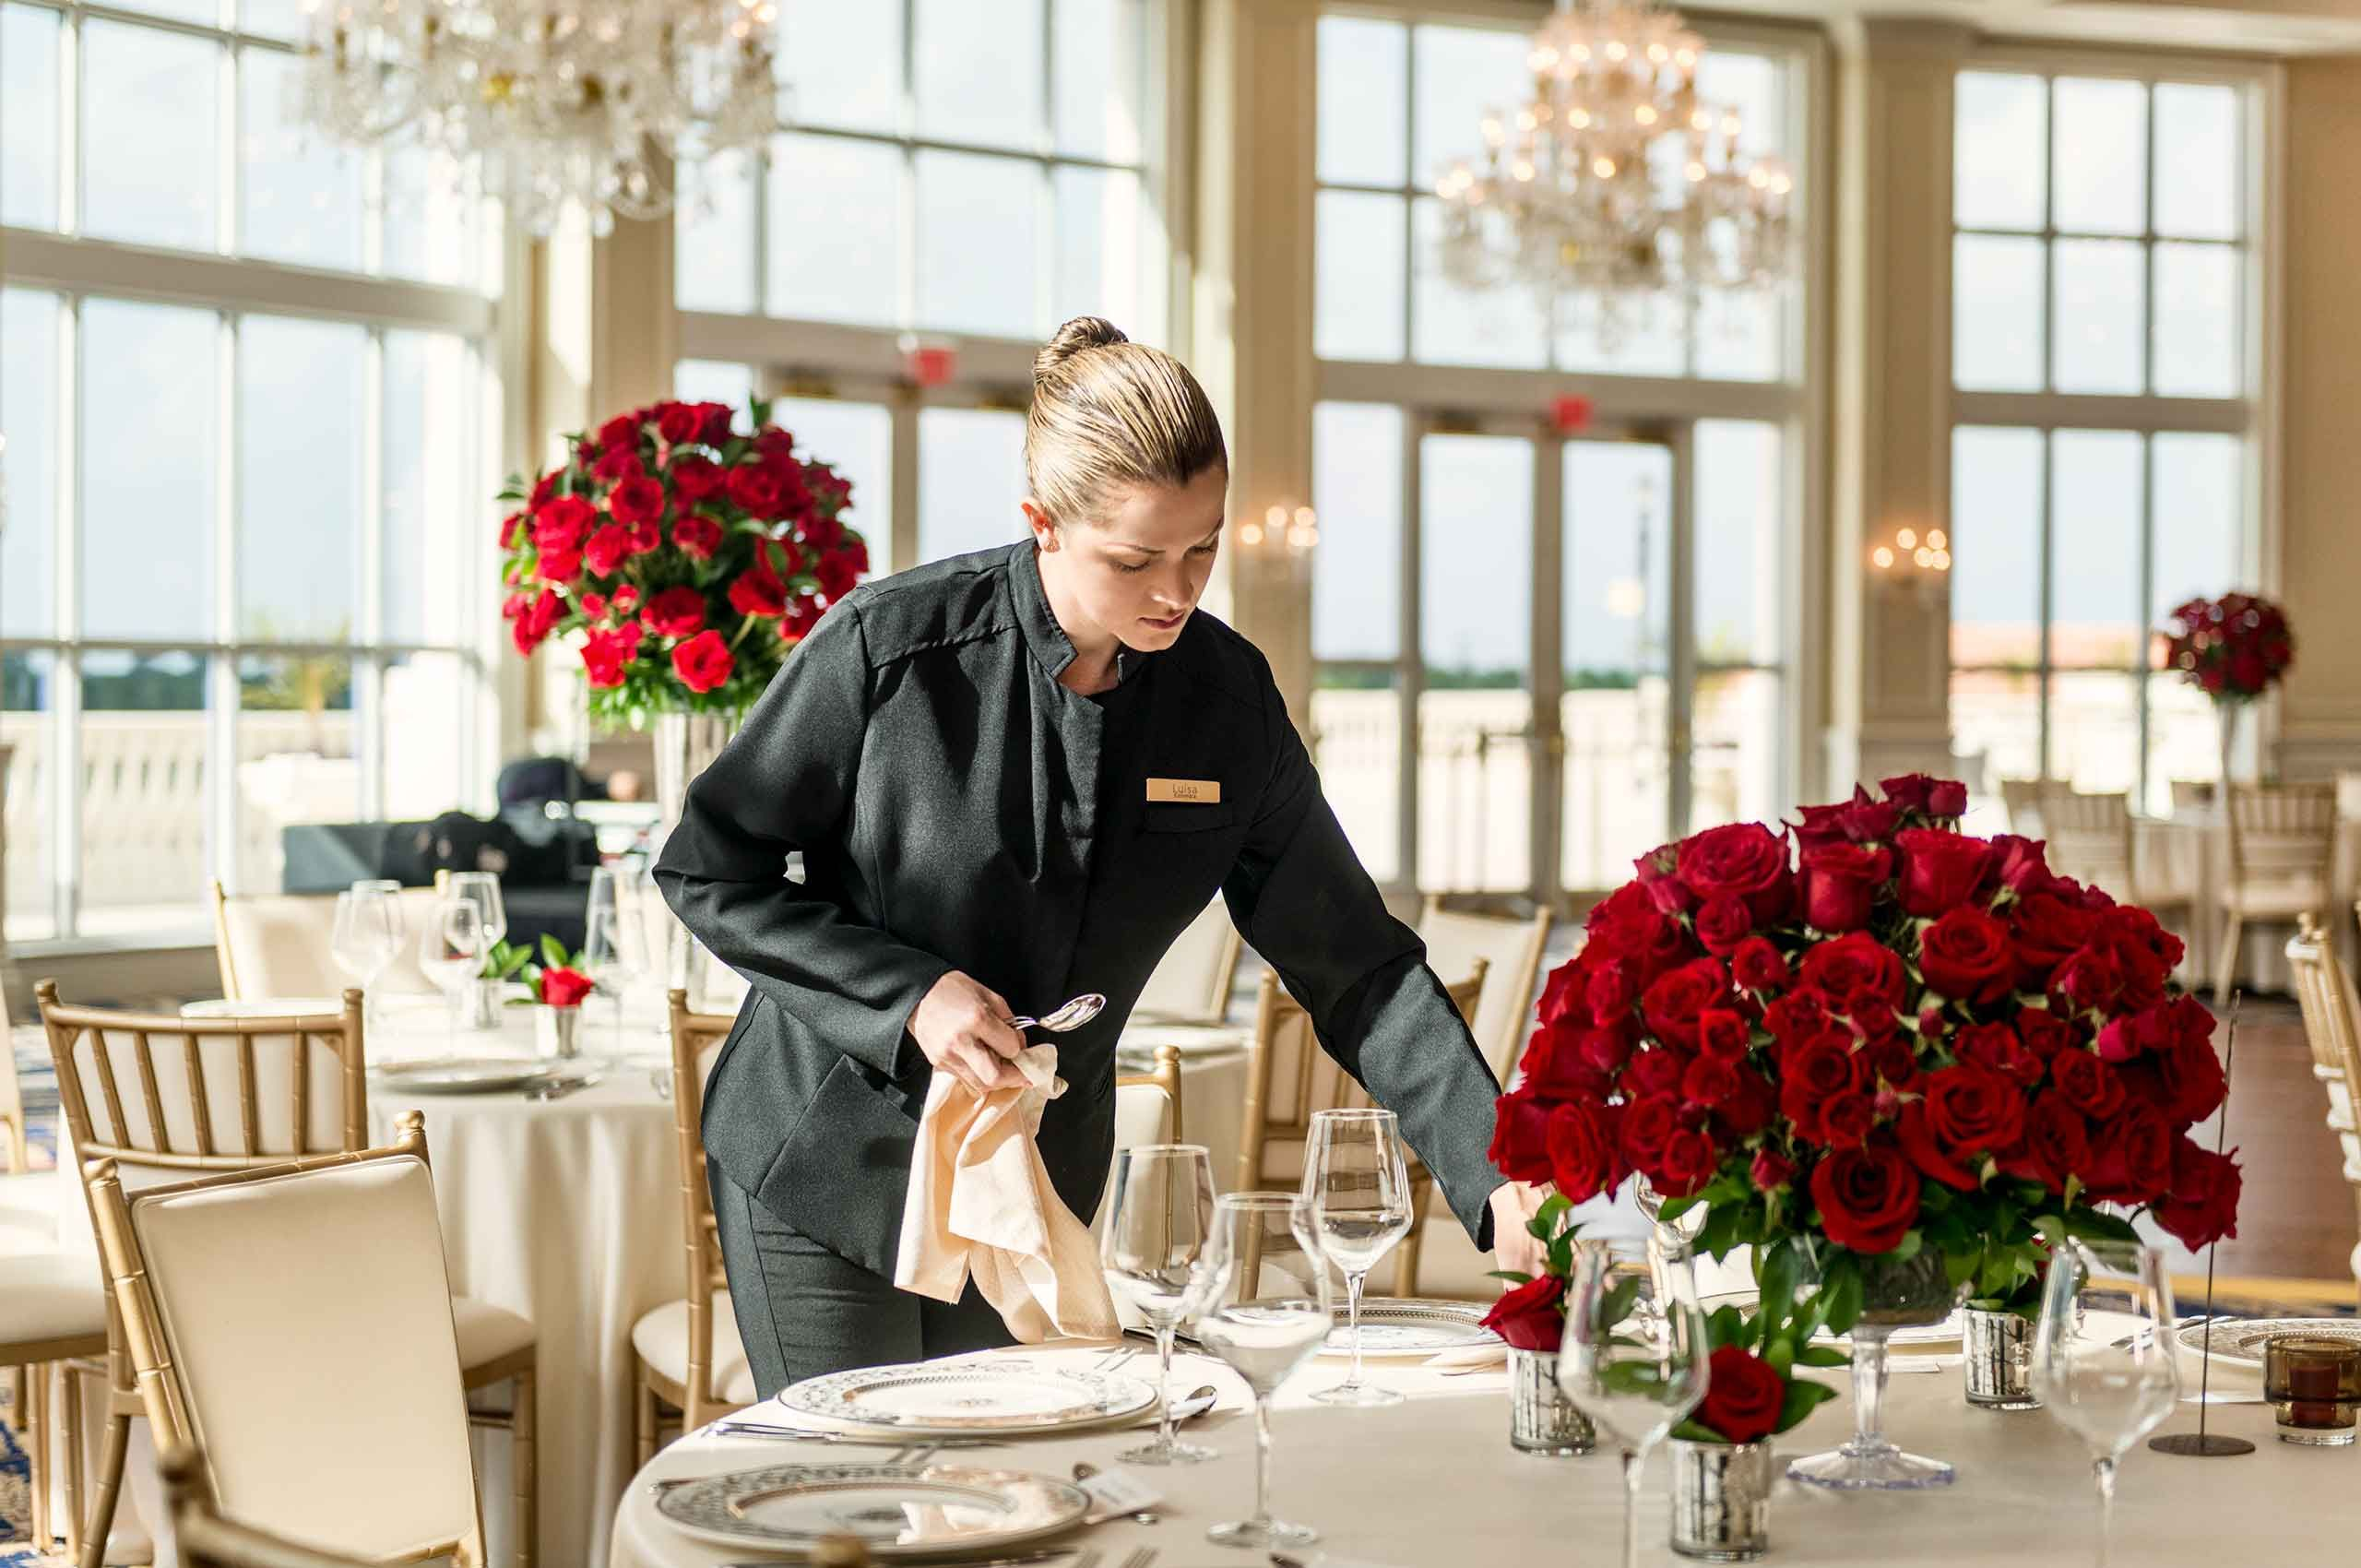 Server-setting-table-by-WeddingVenue-by-HenrikOlundPhotography.jpg